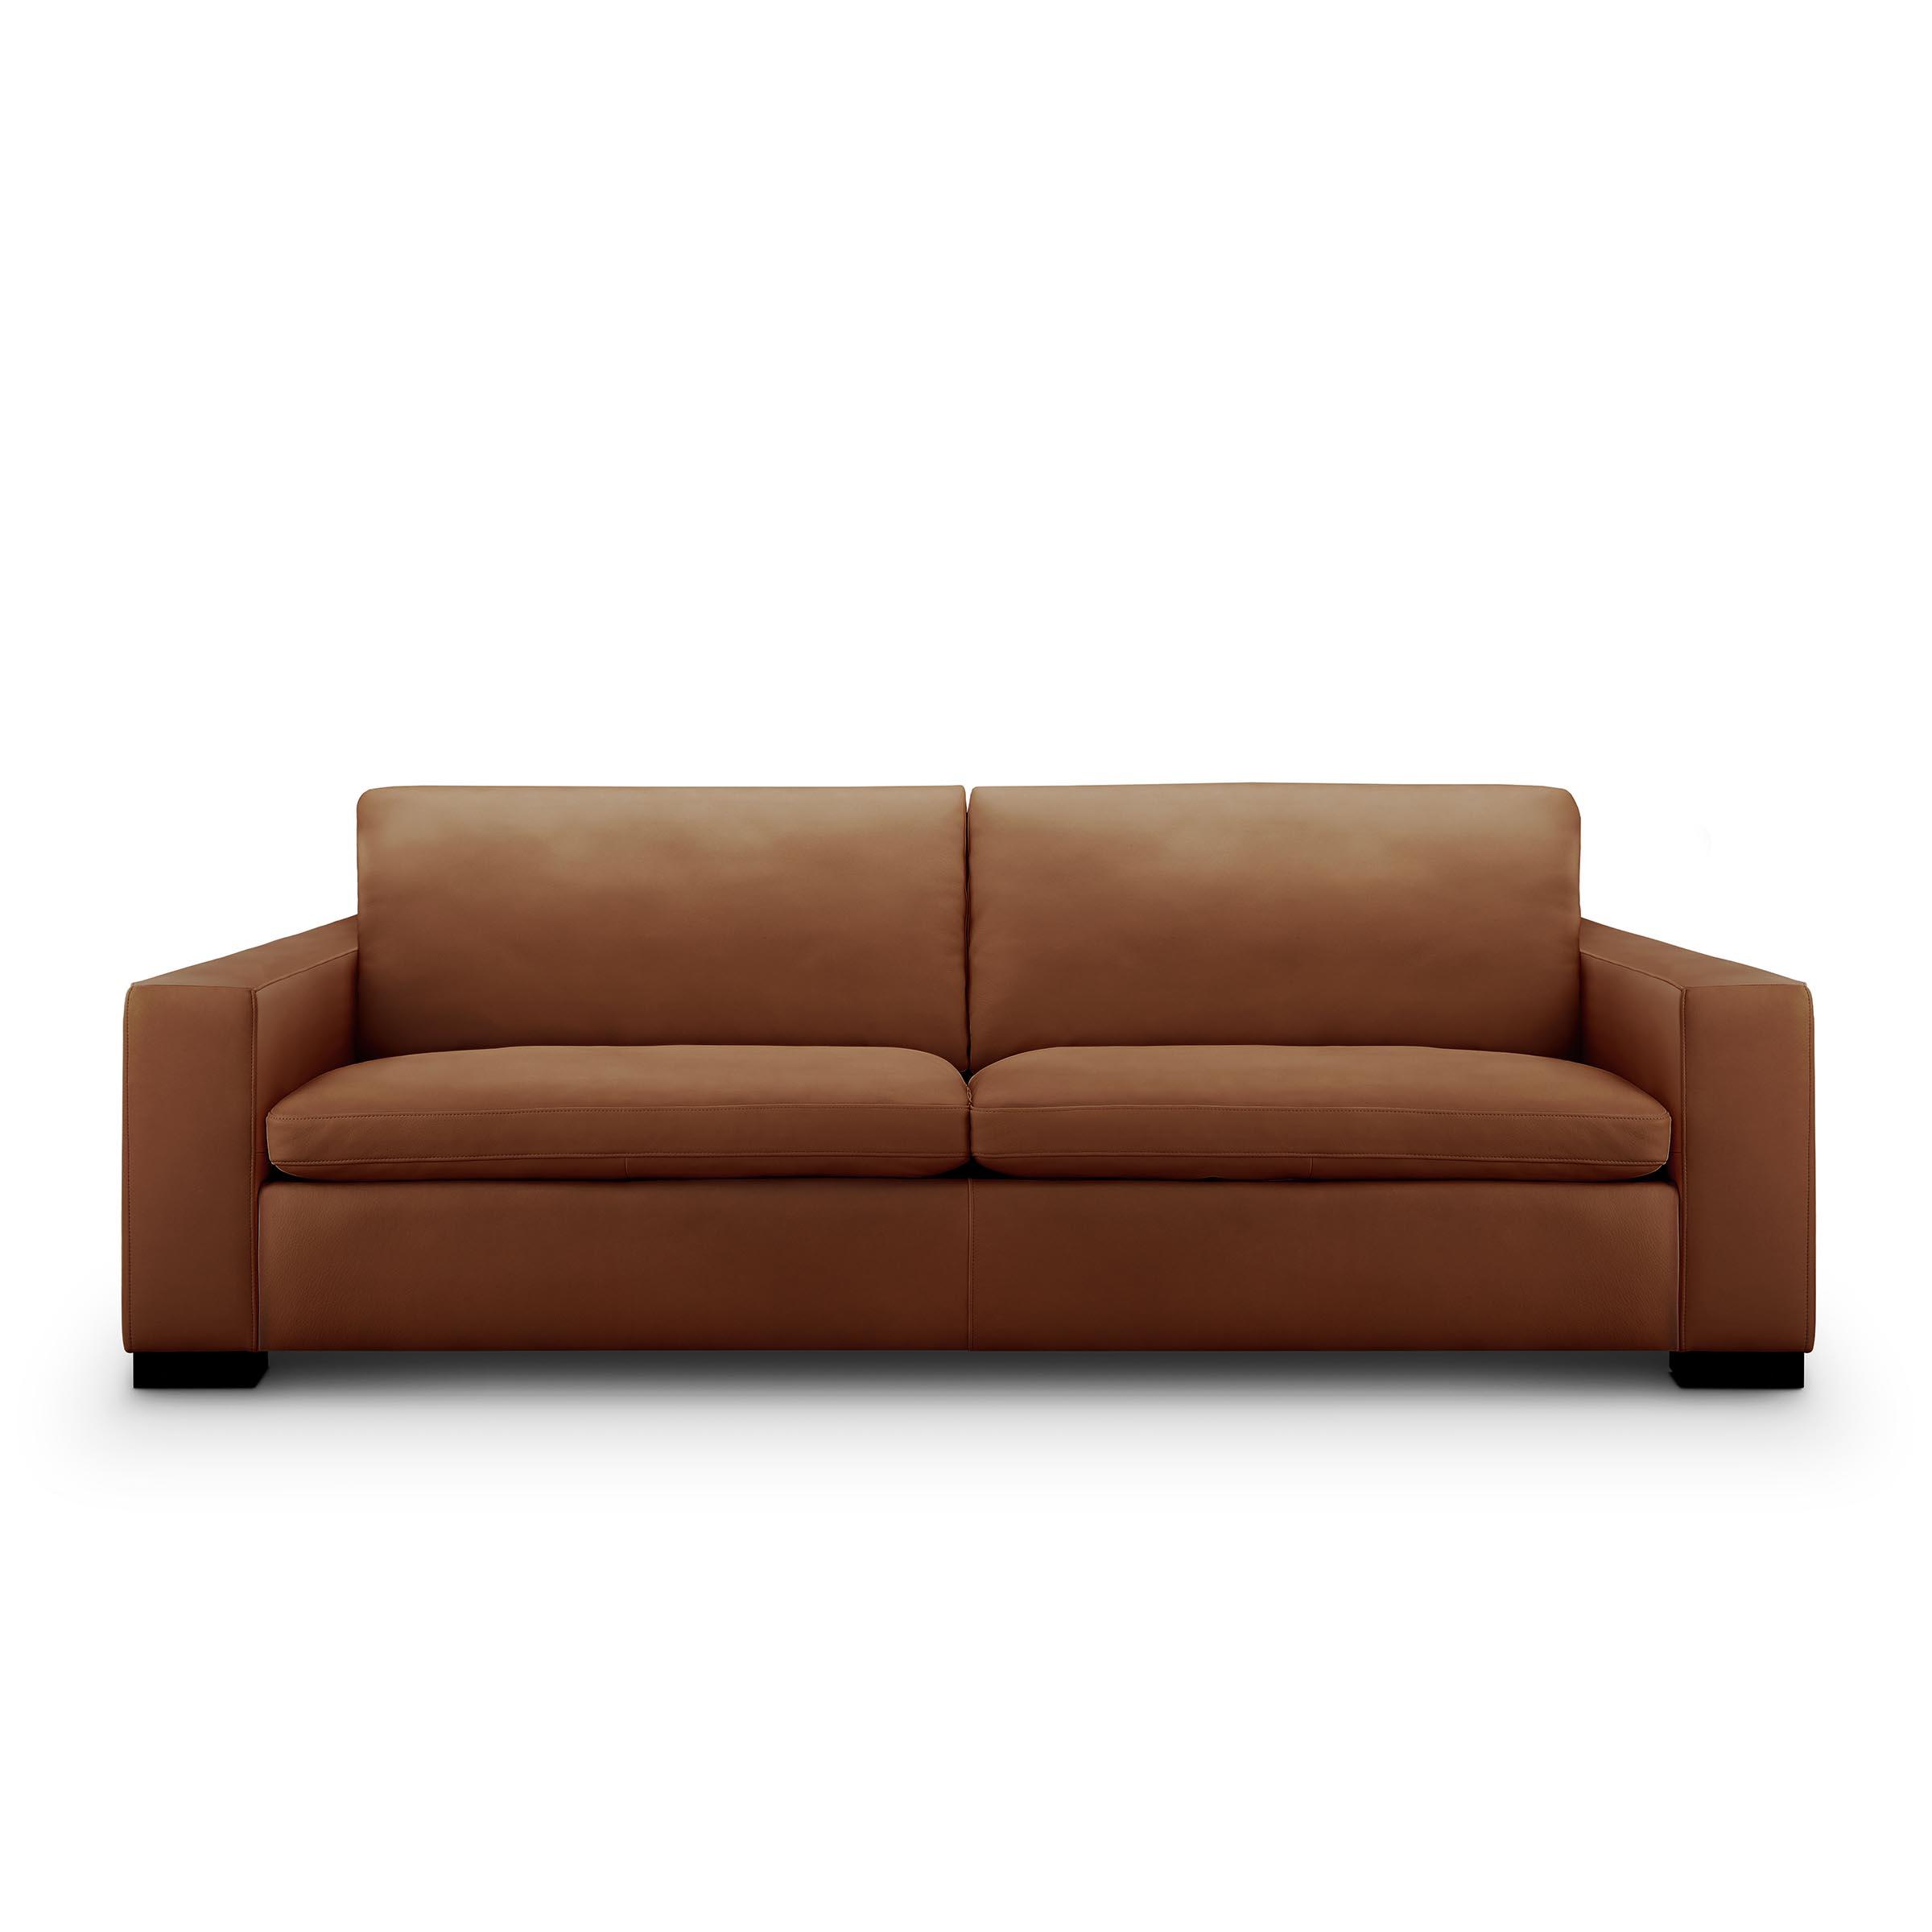 ERE 032 Essentials Leather